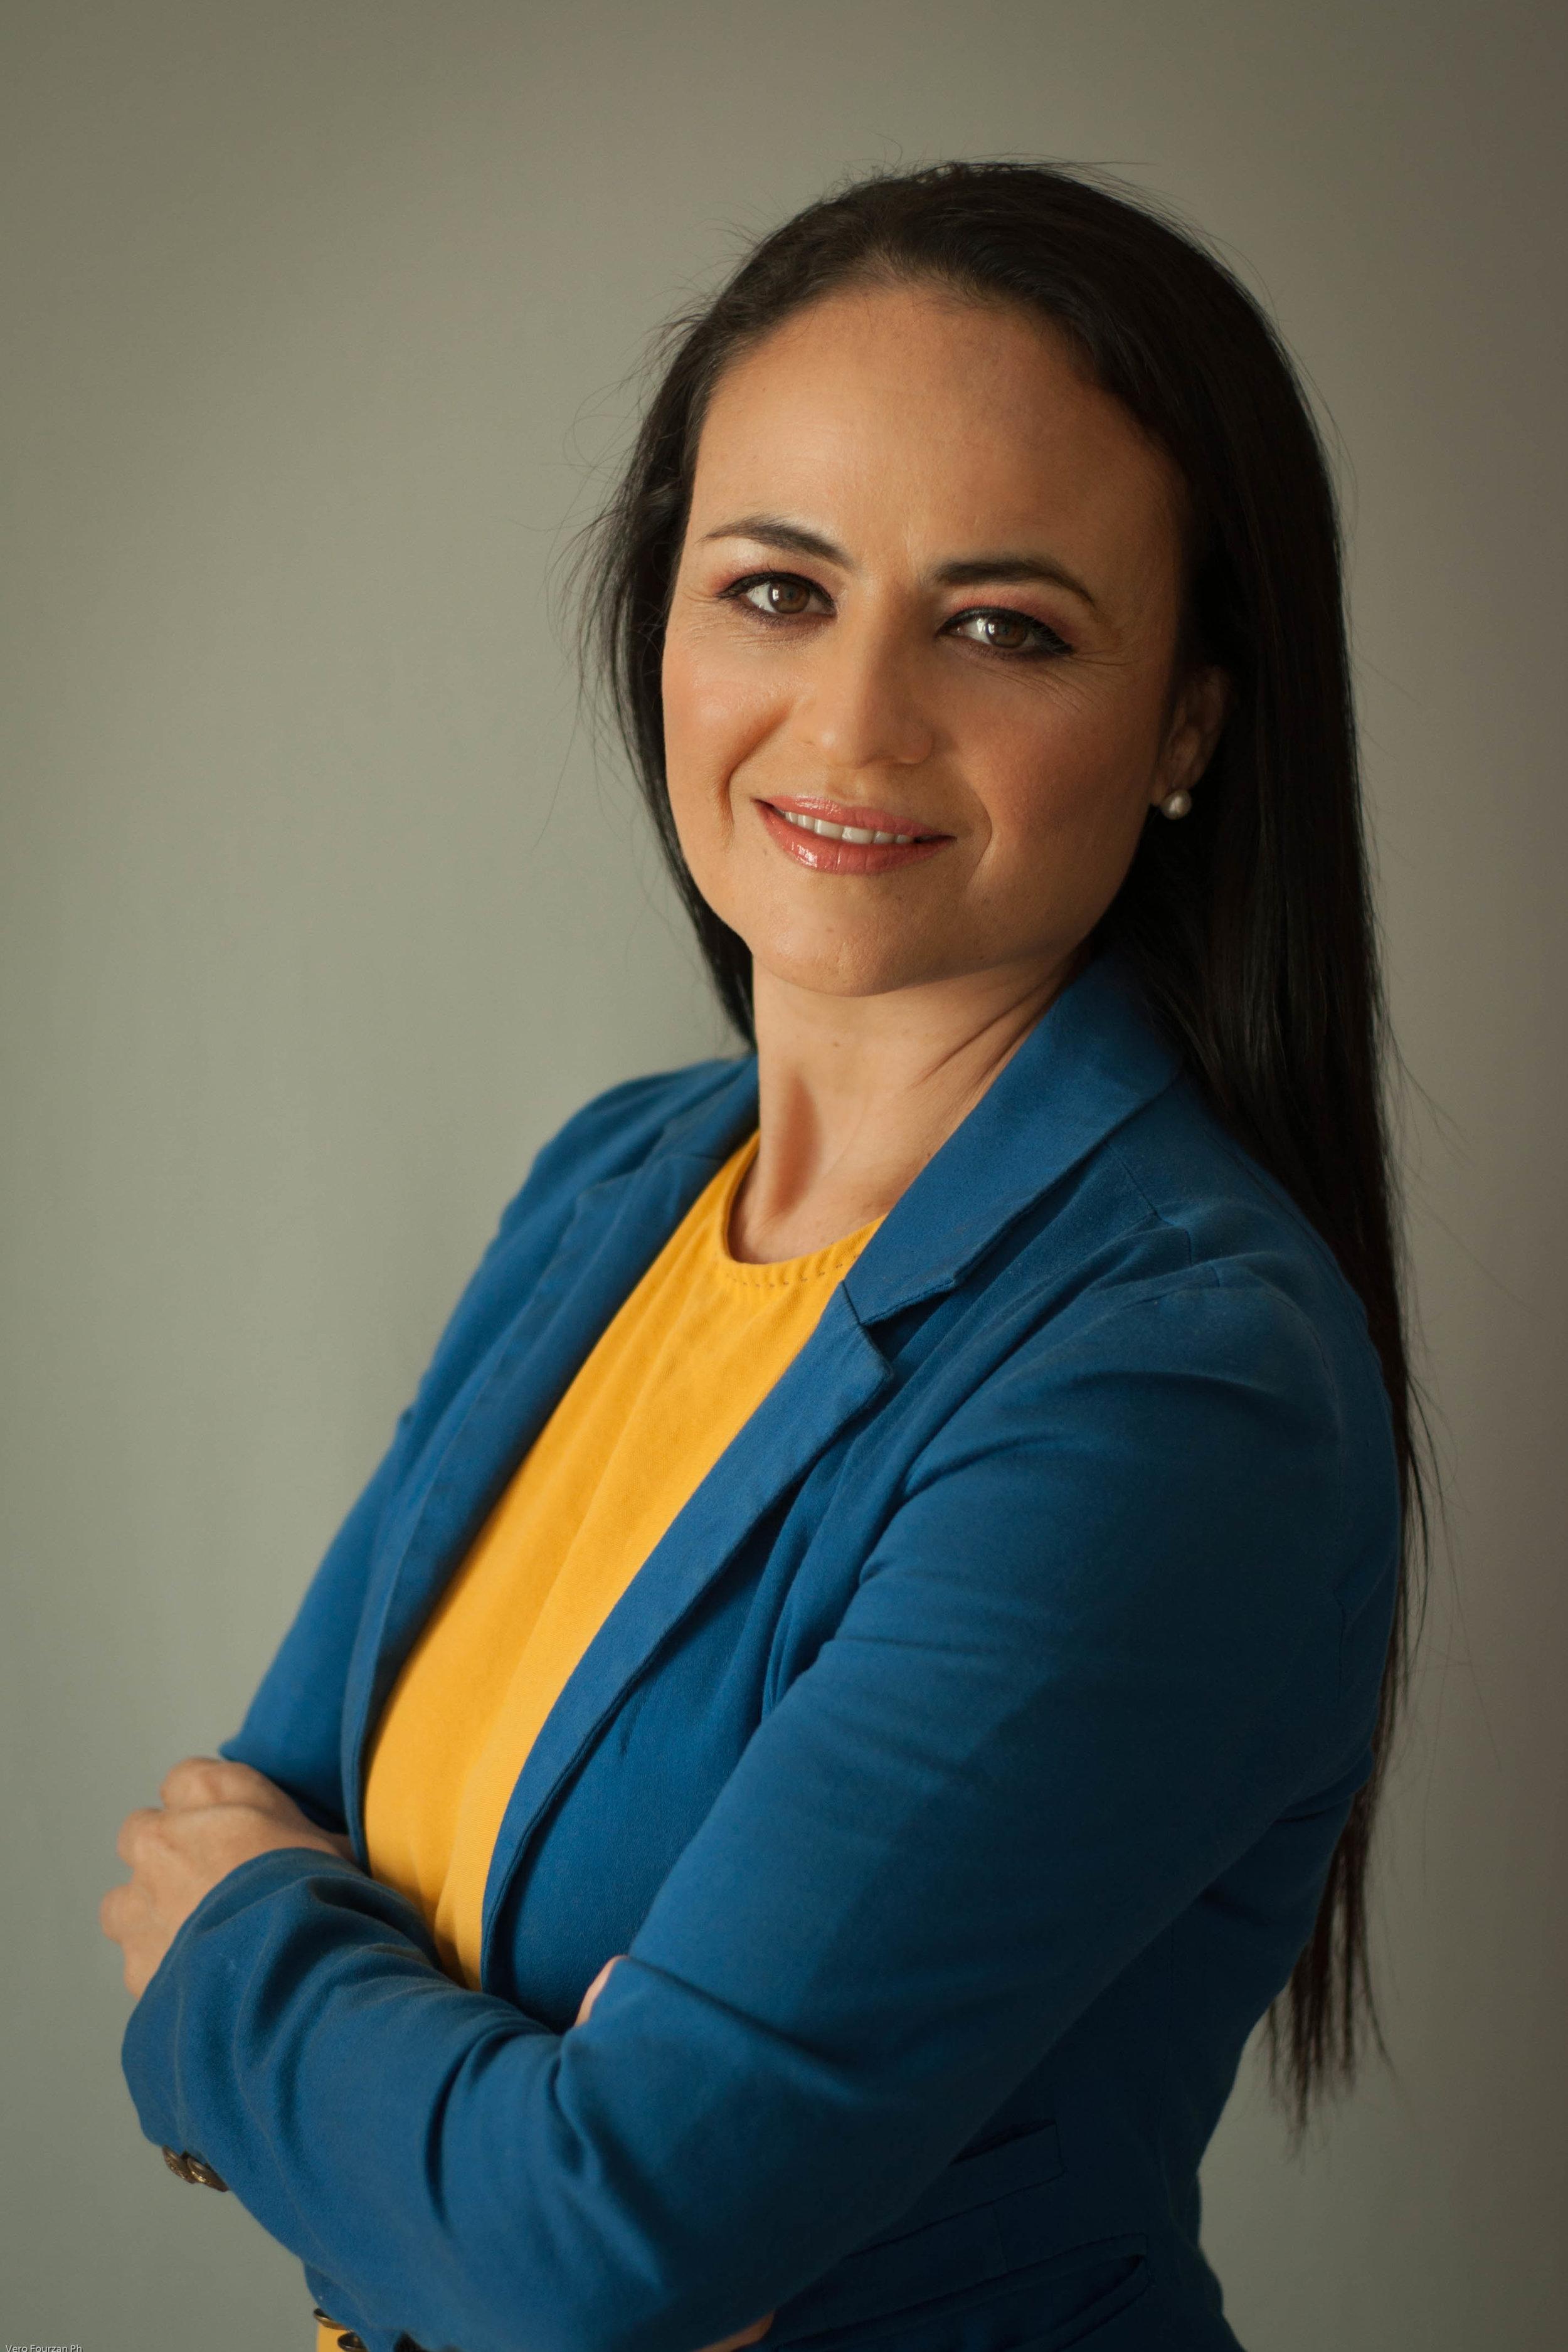 Alejandra Arias - Spanish spoken Real Estate Advisor / Españolalejandra@selvacorealty.com